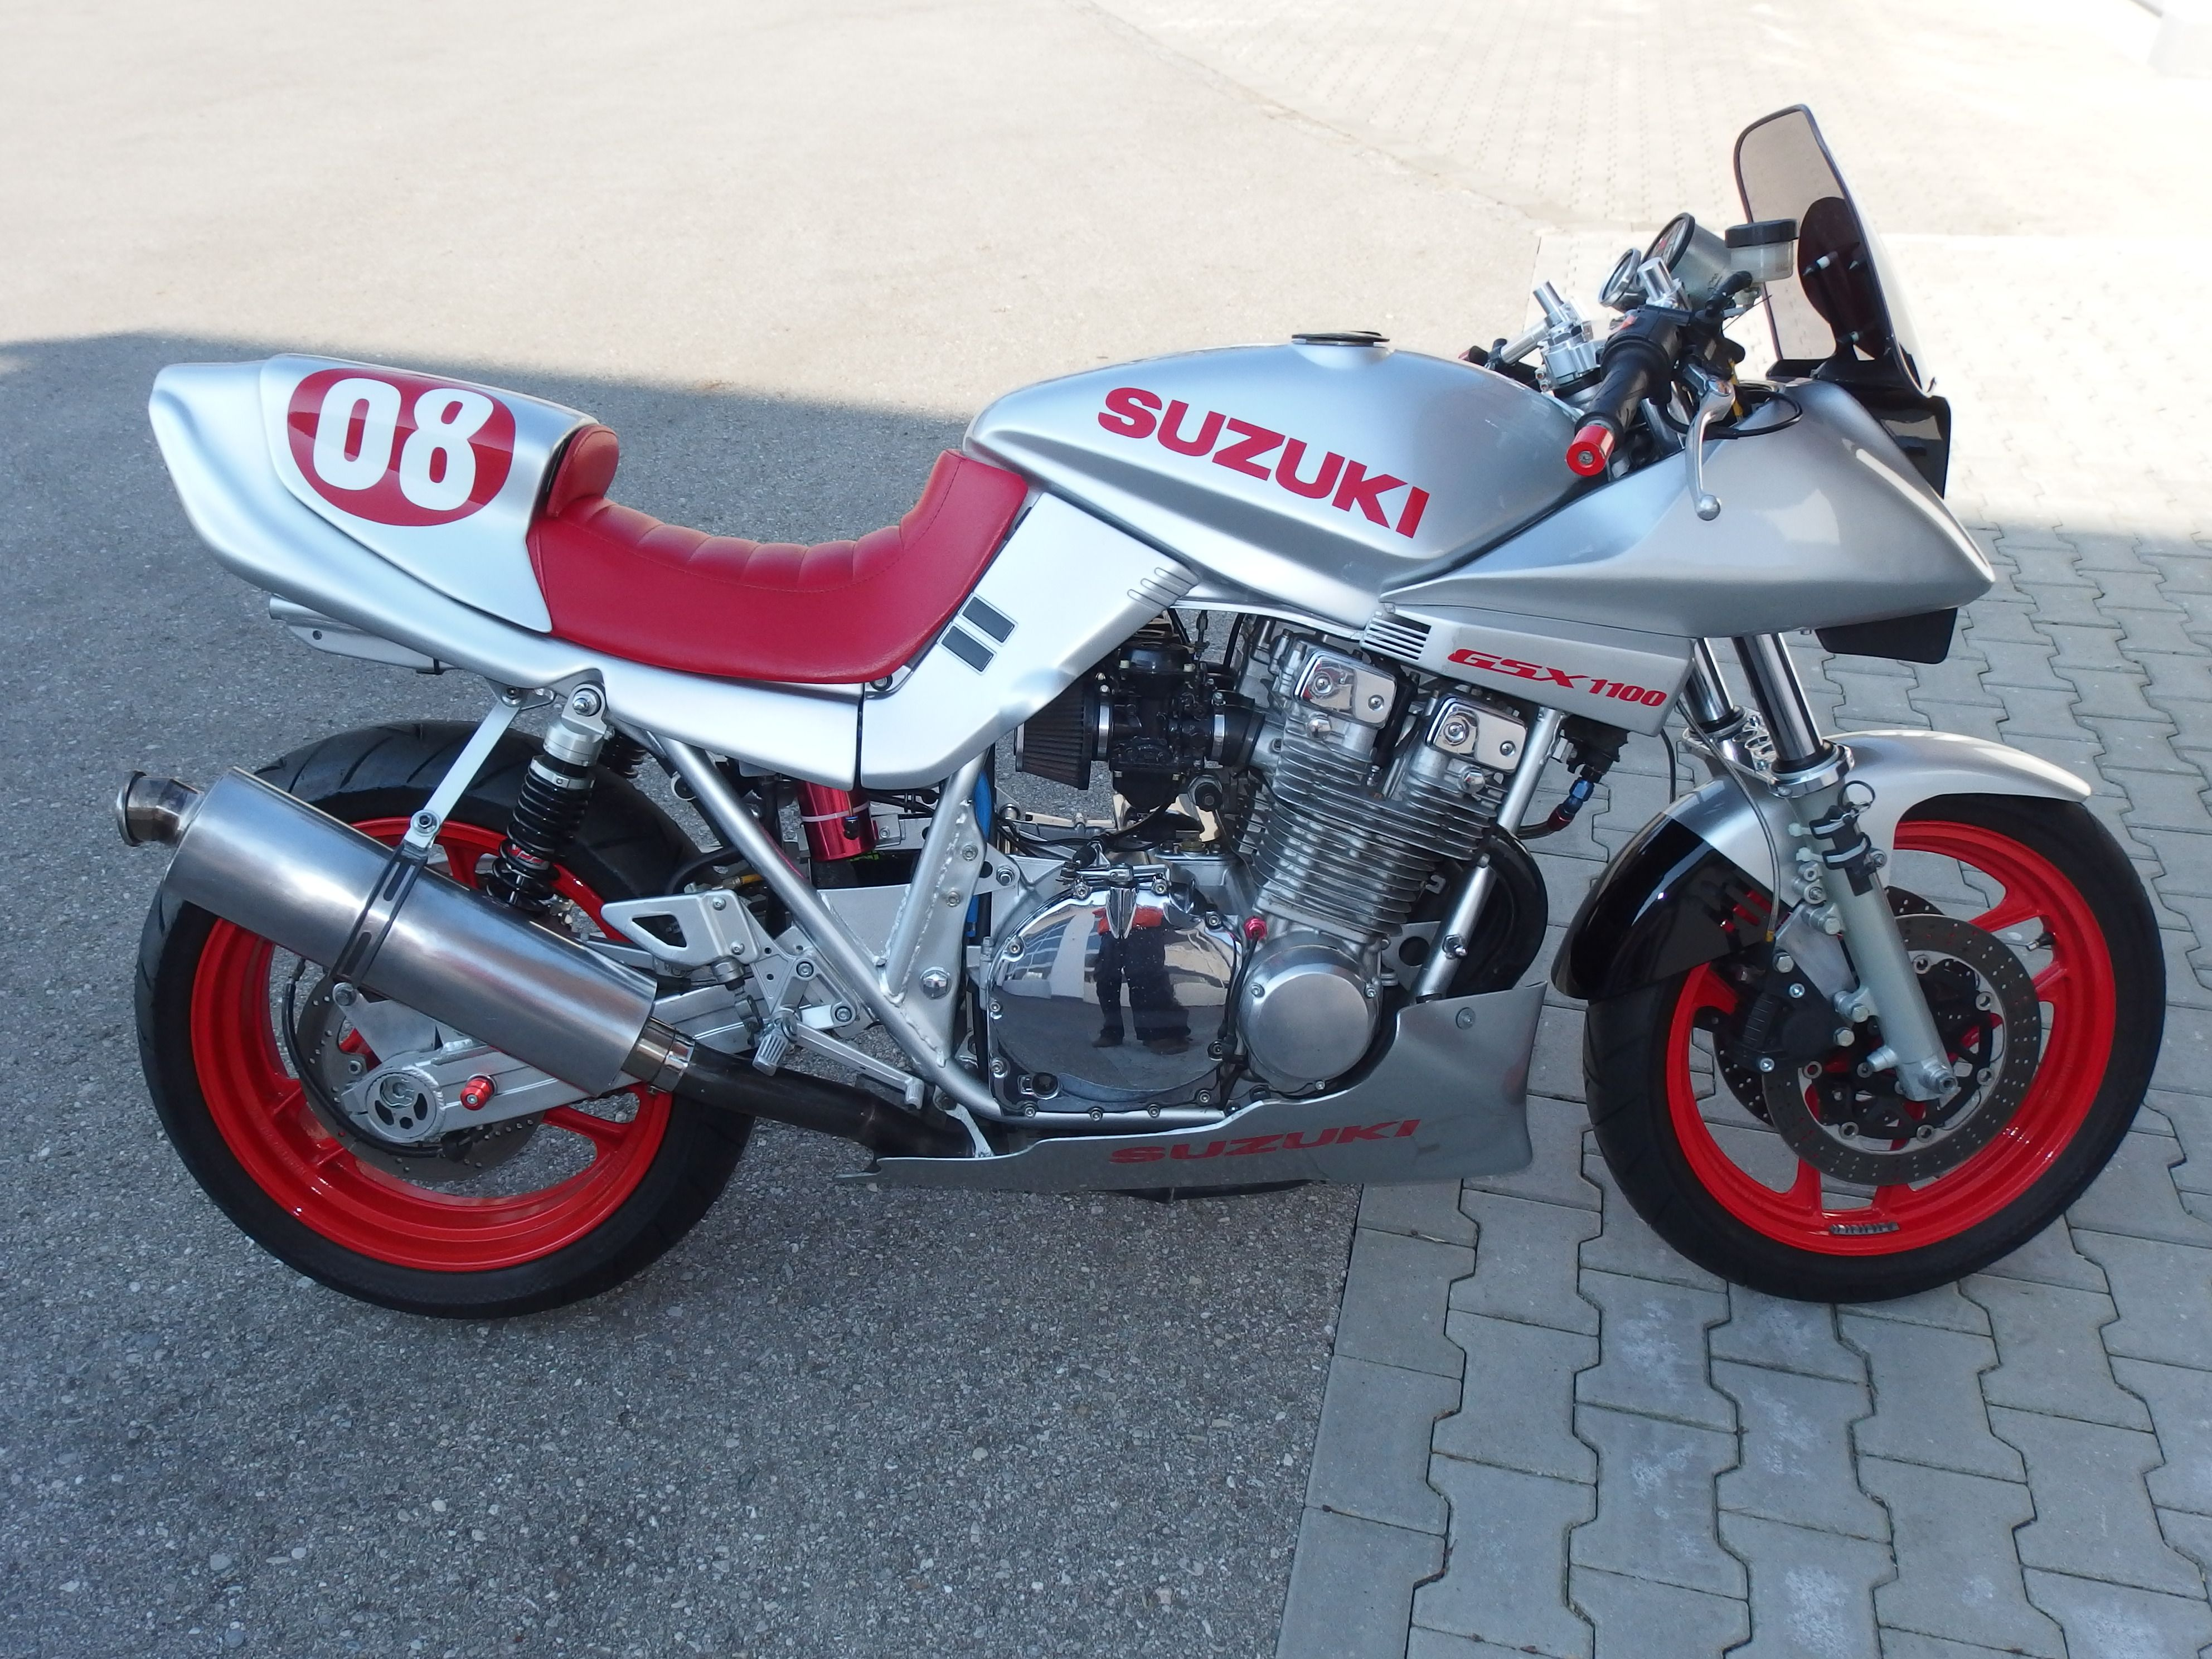 suzuki gsx1100 katana modified for classic races